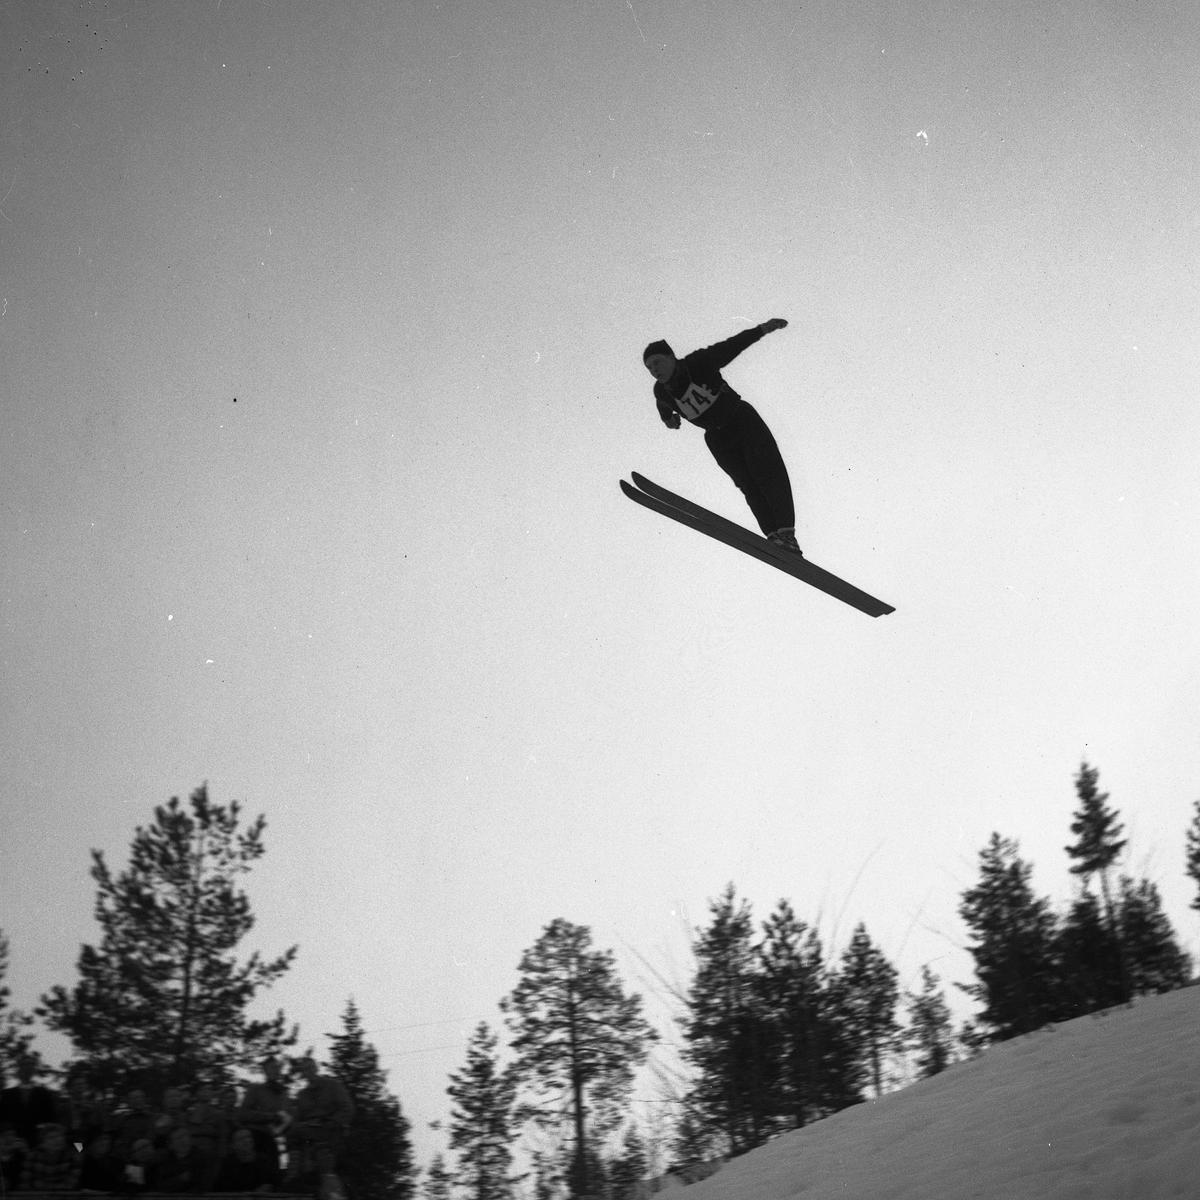 Kongsberg skier Wallø in action